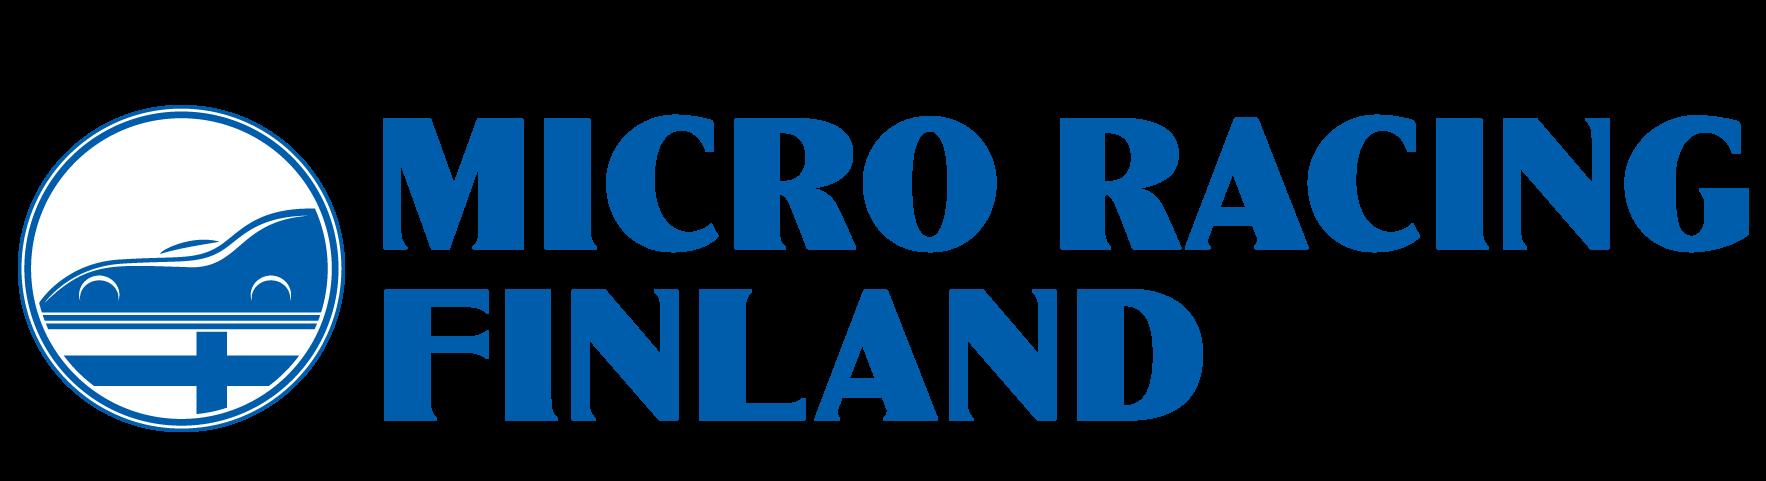 Micro Racing Finland